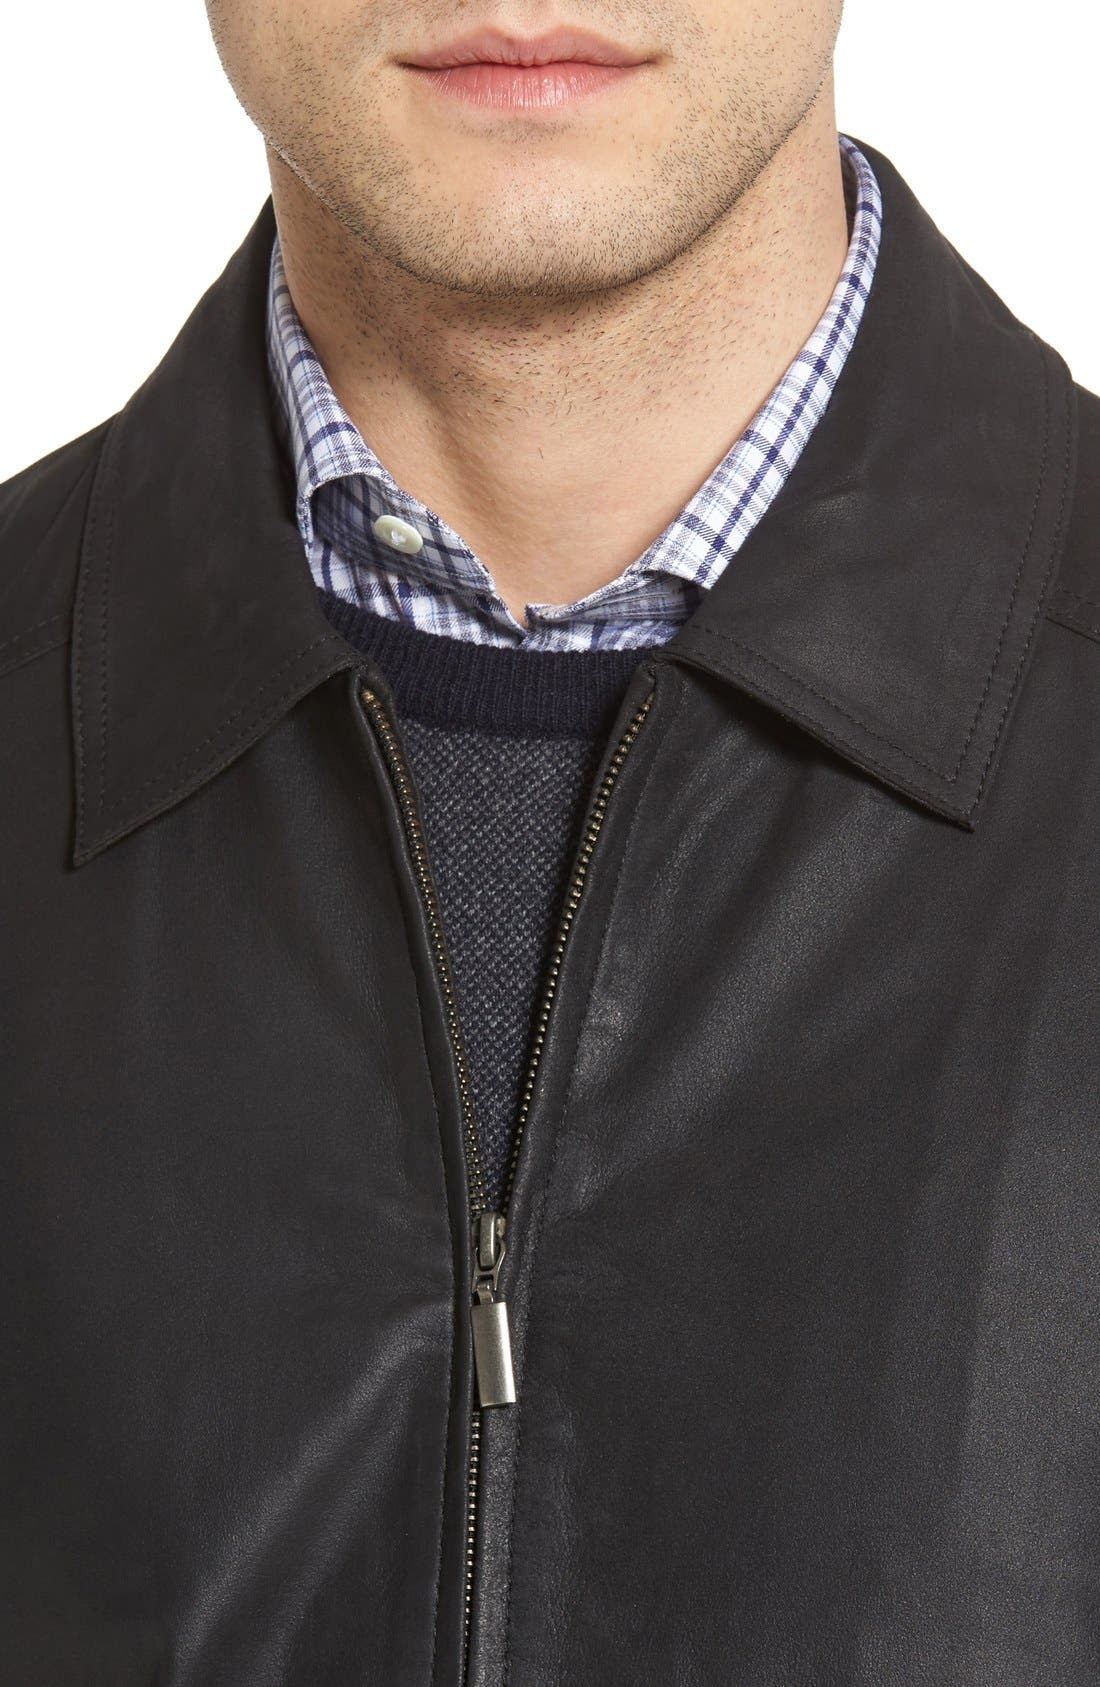 MissaniLe CollezioniLambskin Leather Jacket,                             Alternate thumbnail 3, color,                             BLACK